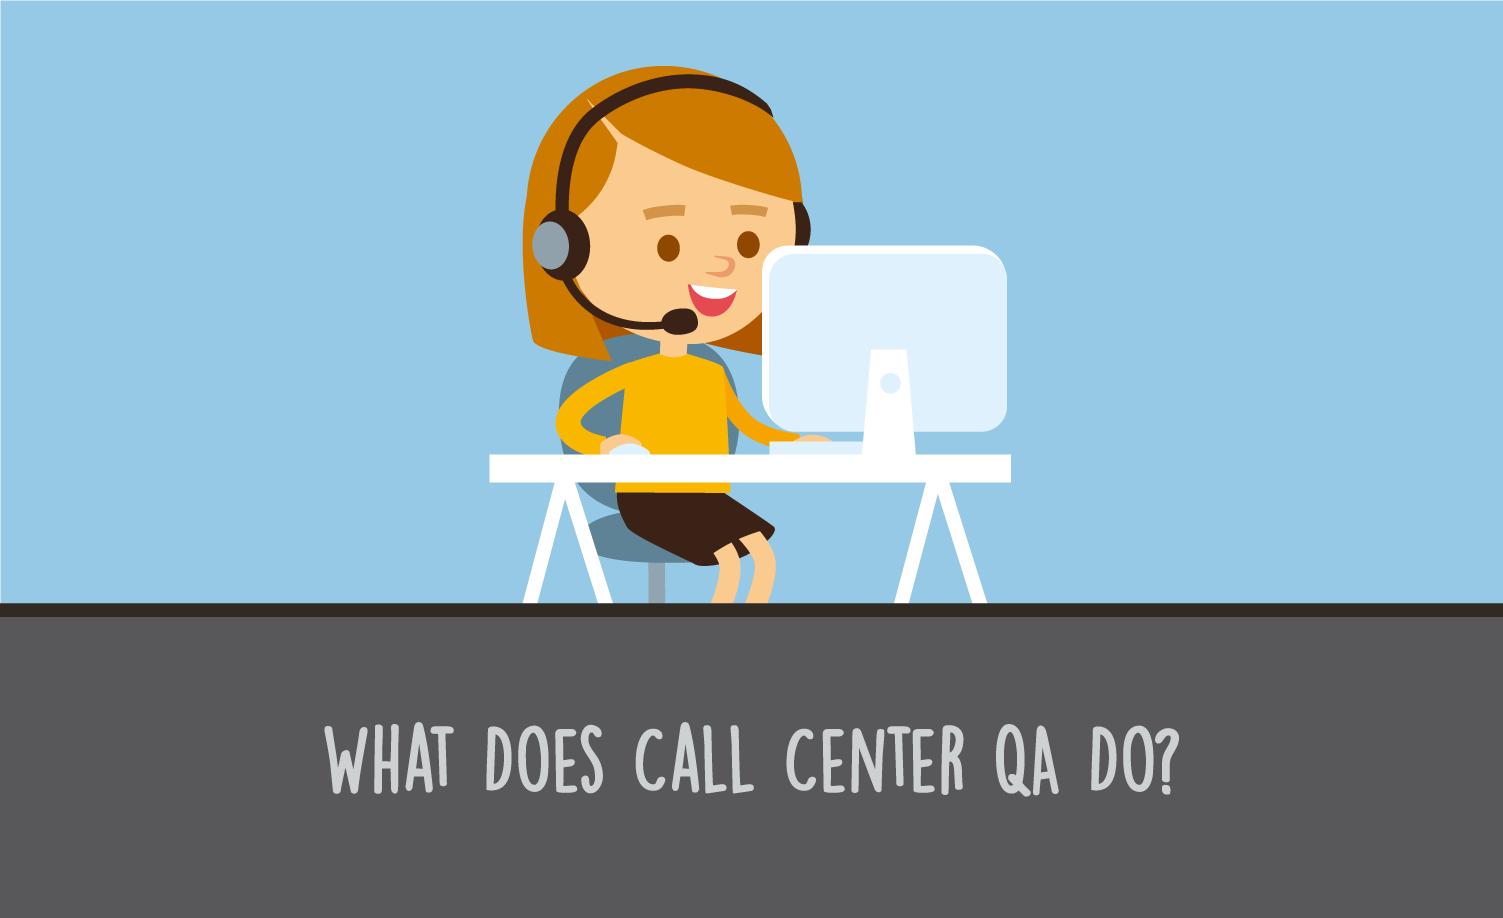 Implement Effective Call Center Quality Assurance Program | US ScorebuddyQA